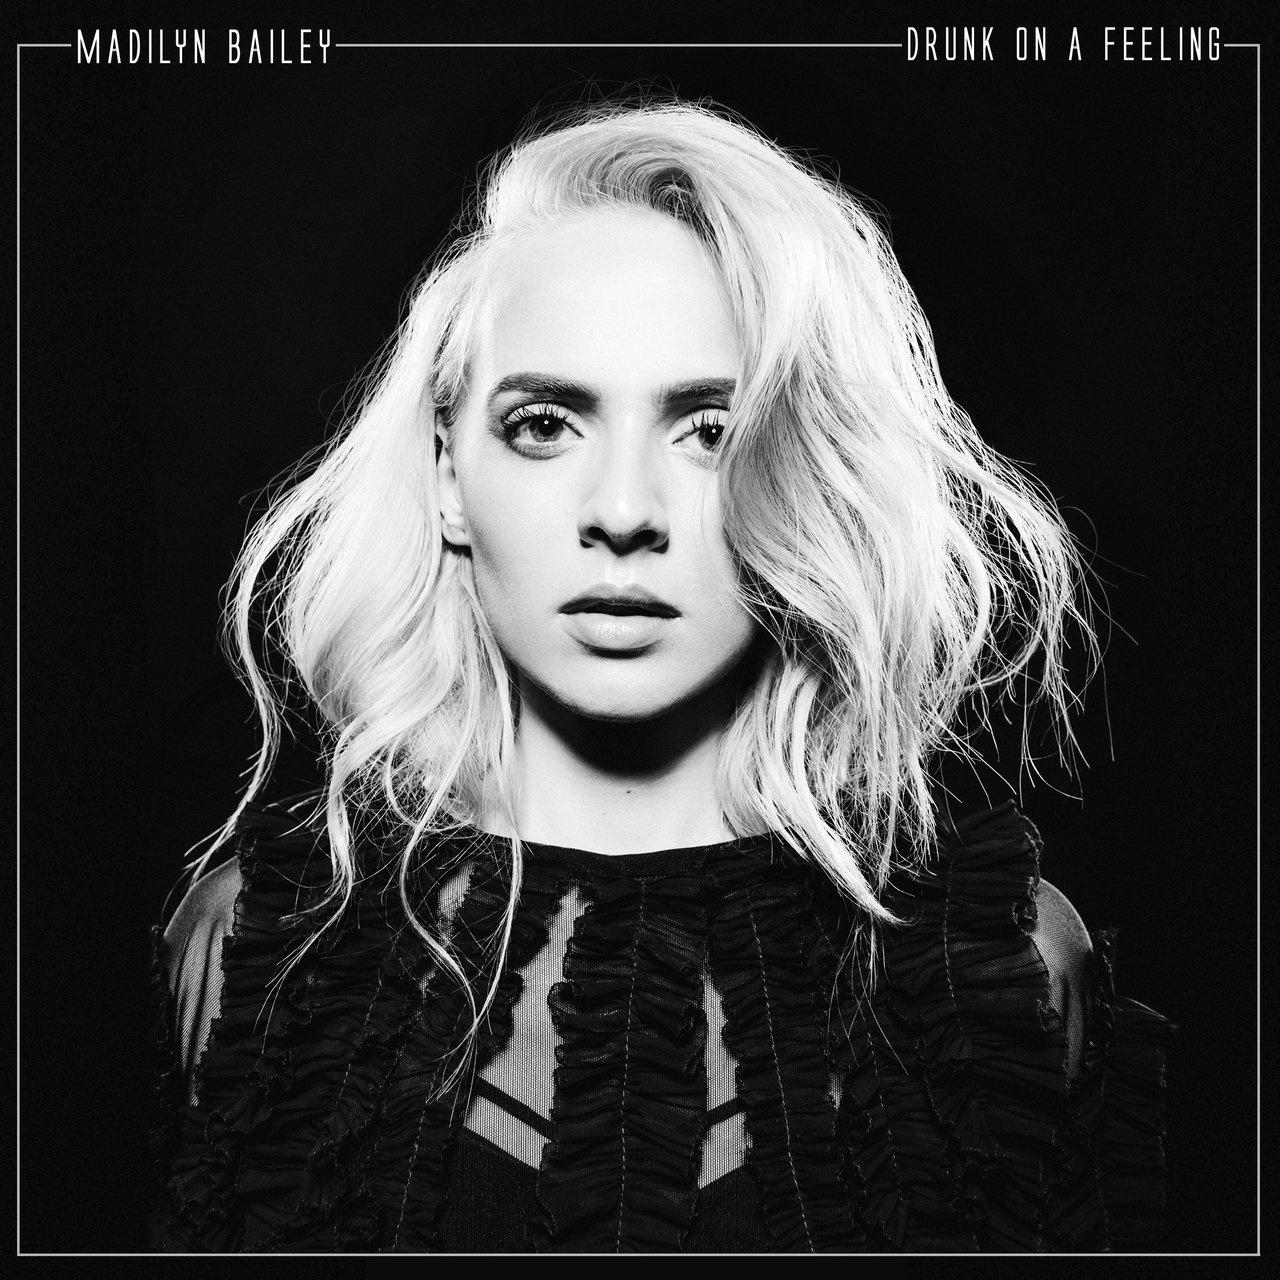 [4K] Madilyn Bailey - Drunk on a Feeling (Official Video)